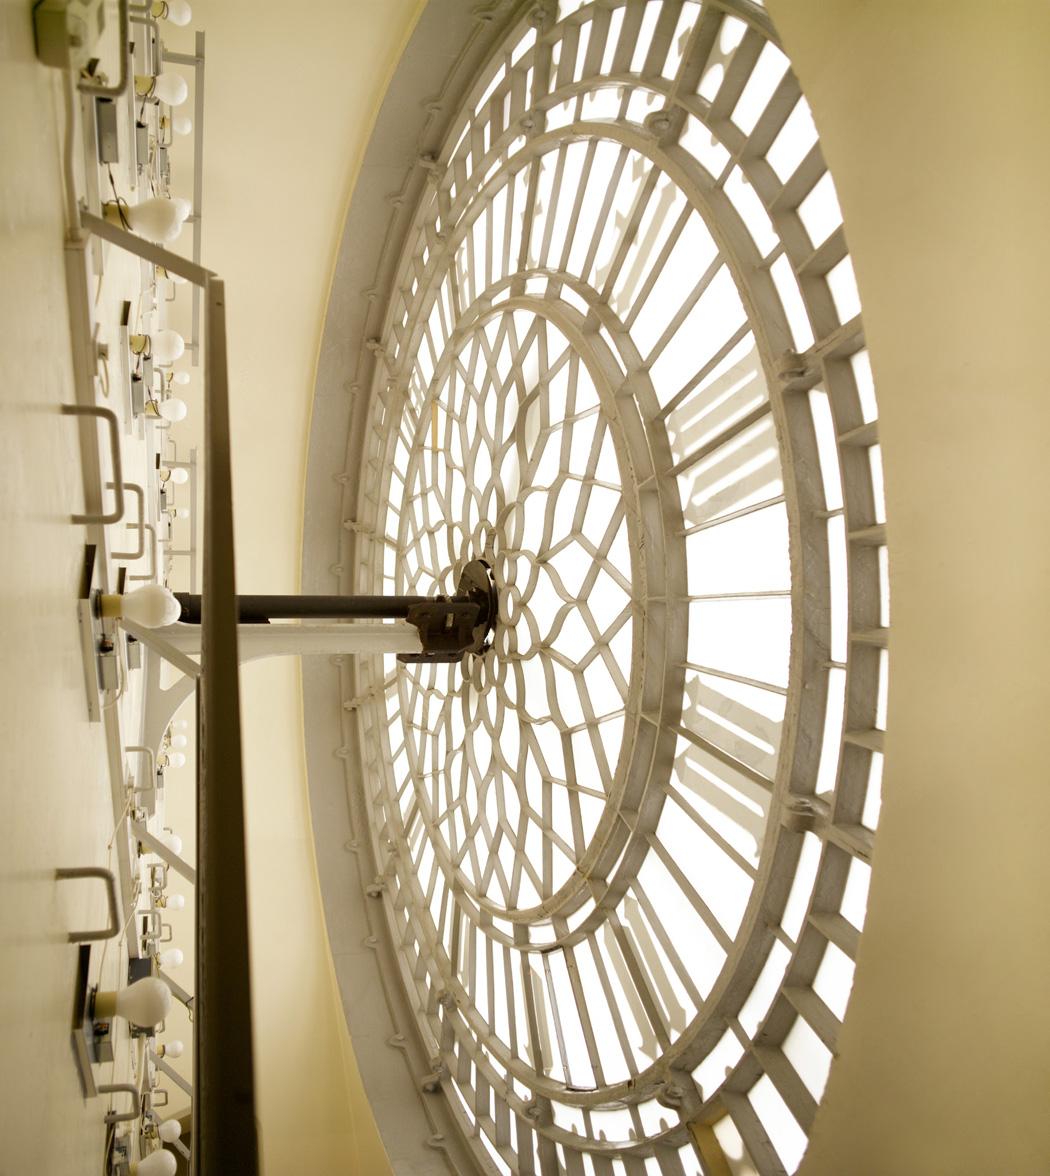 BB_Clock face from inside, south_CopyrightPeterDazeley_credit photographer Peter Dazeley